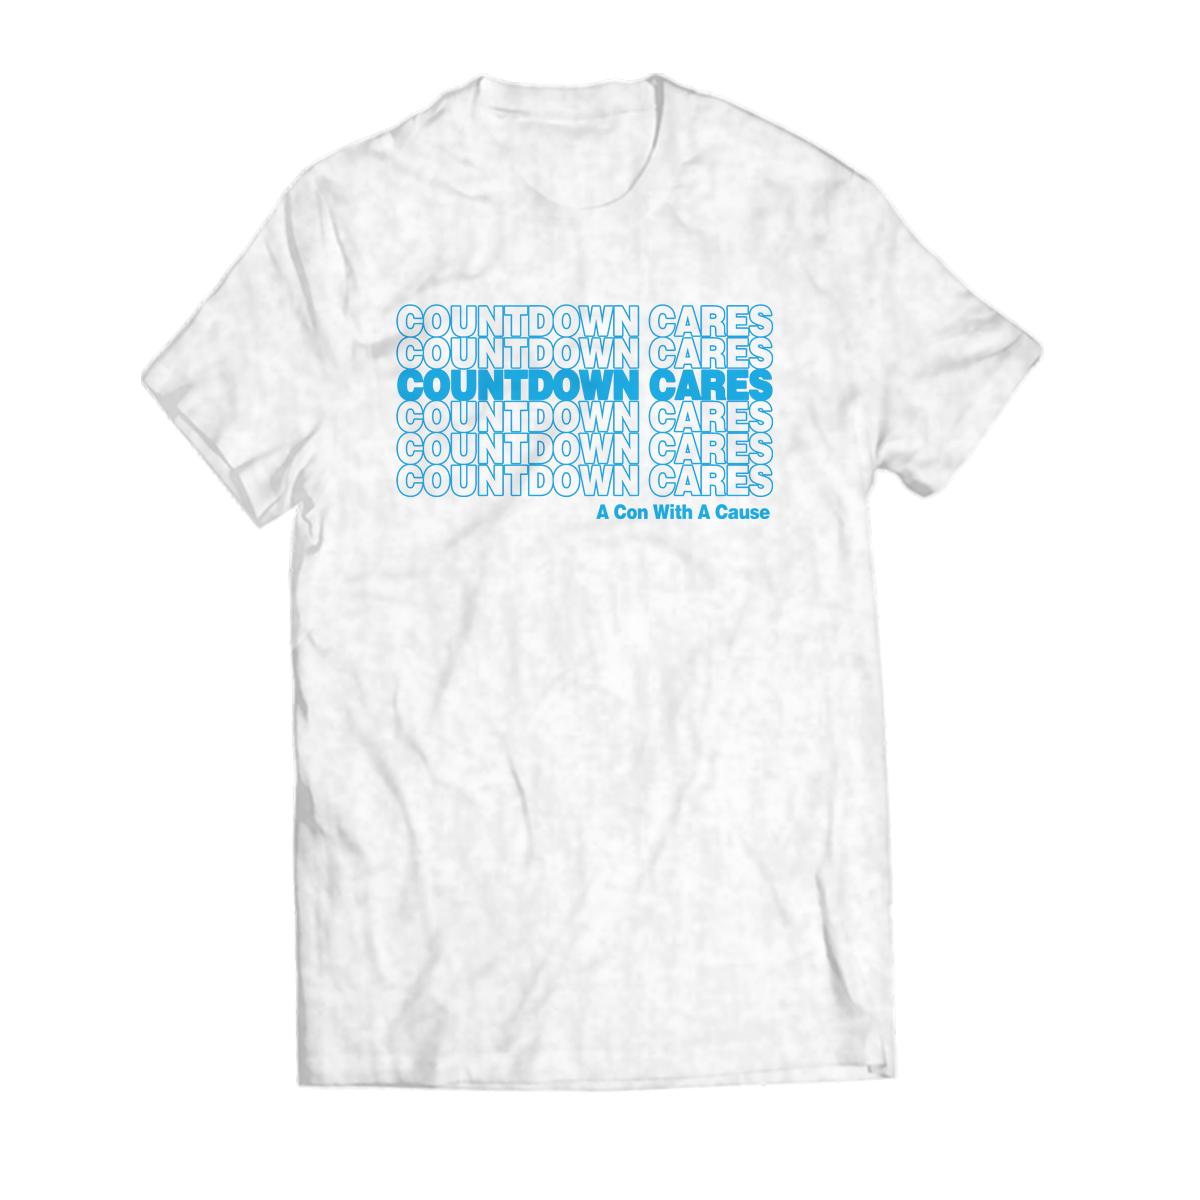 T-Shirt - Countdown Cares - Ash Grey.png